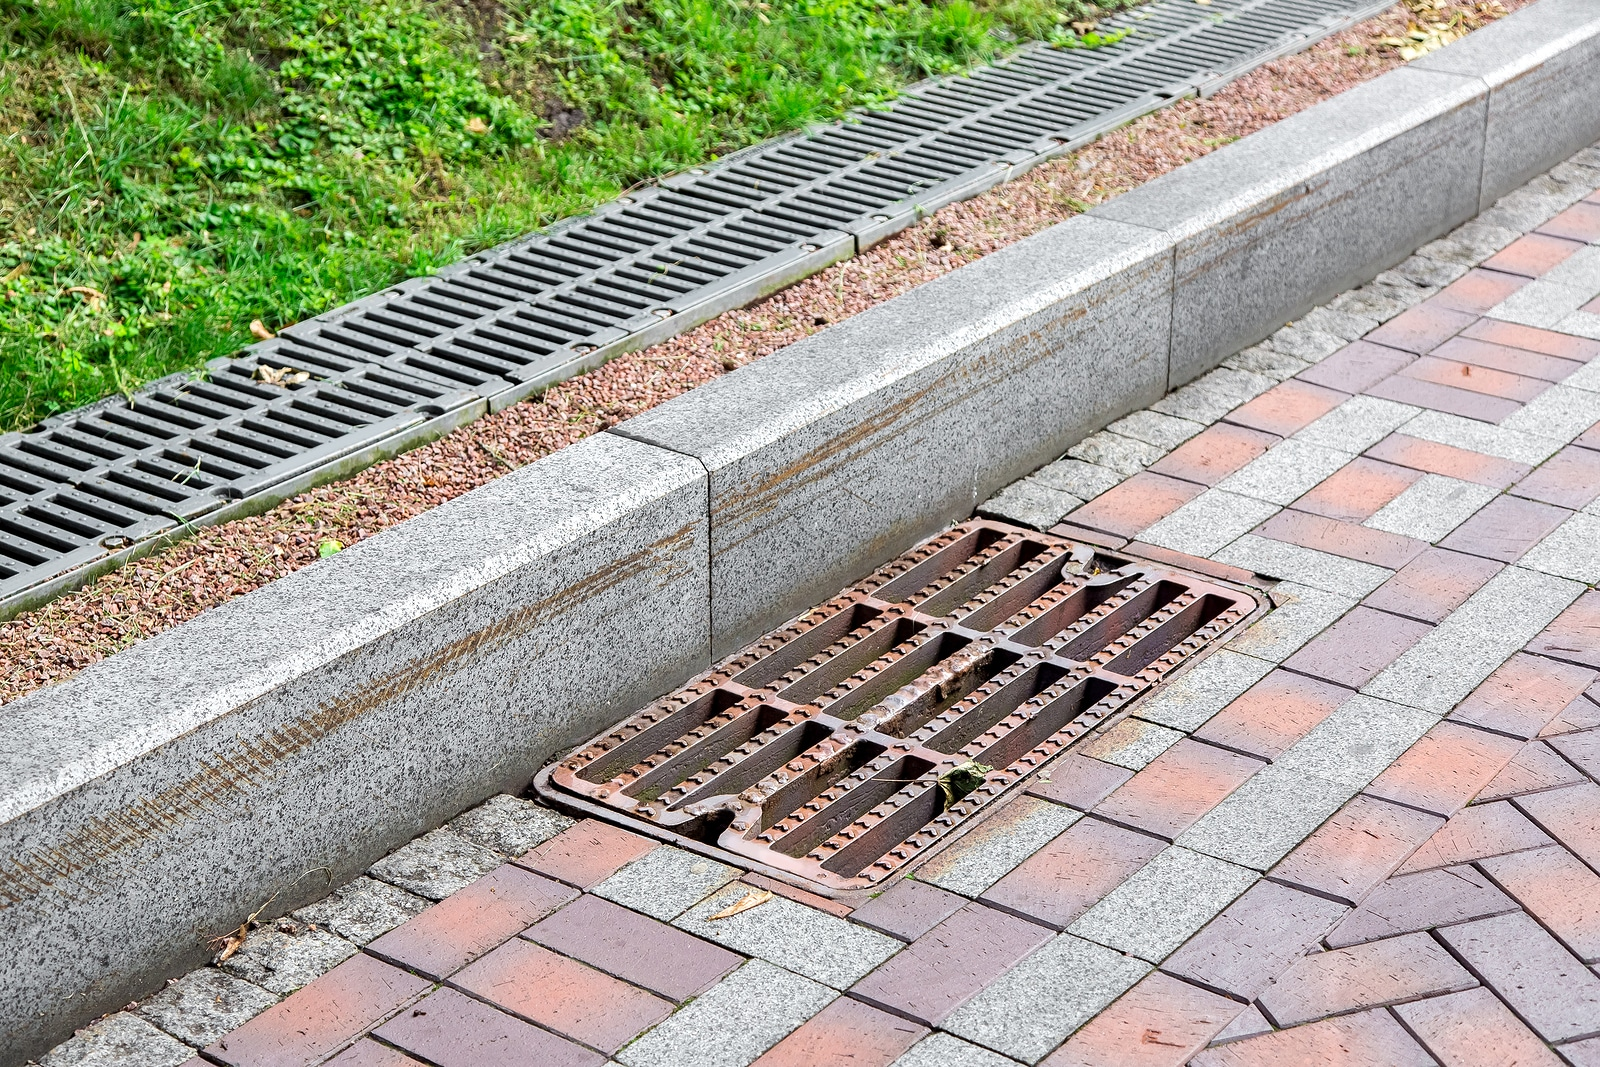 Rainwater Drainage: Can I Run Rainwater into a Sewer?